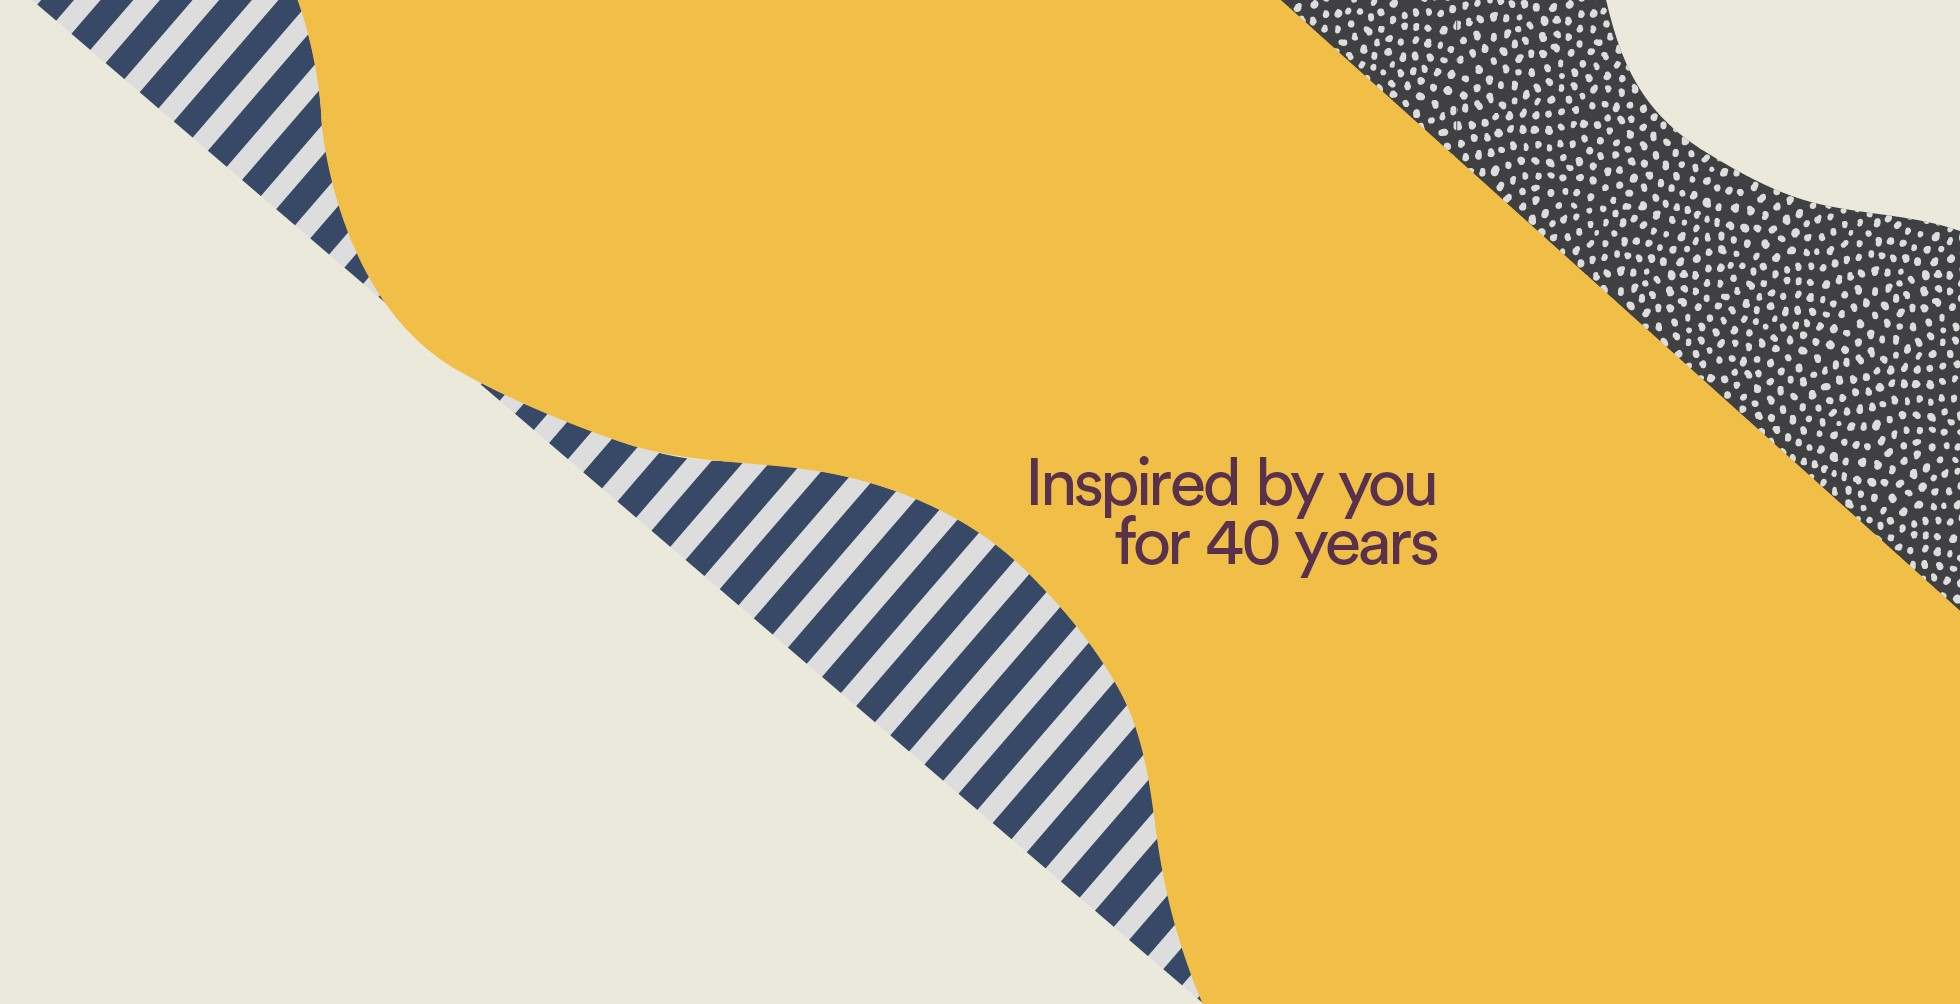 Celebrating 40 years of inspiration